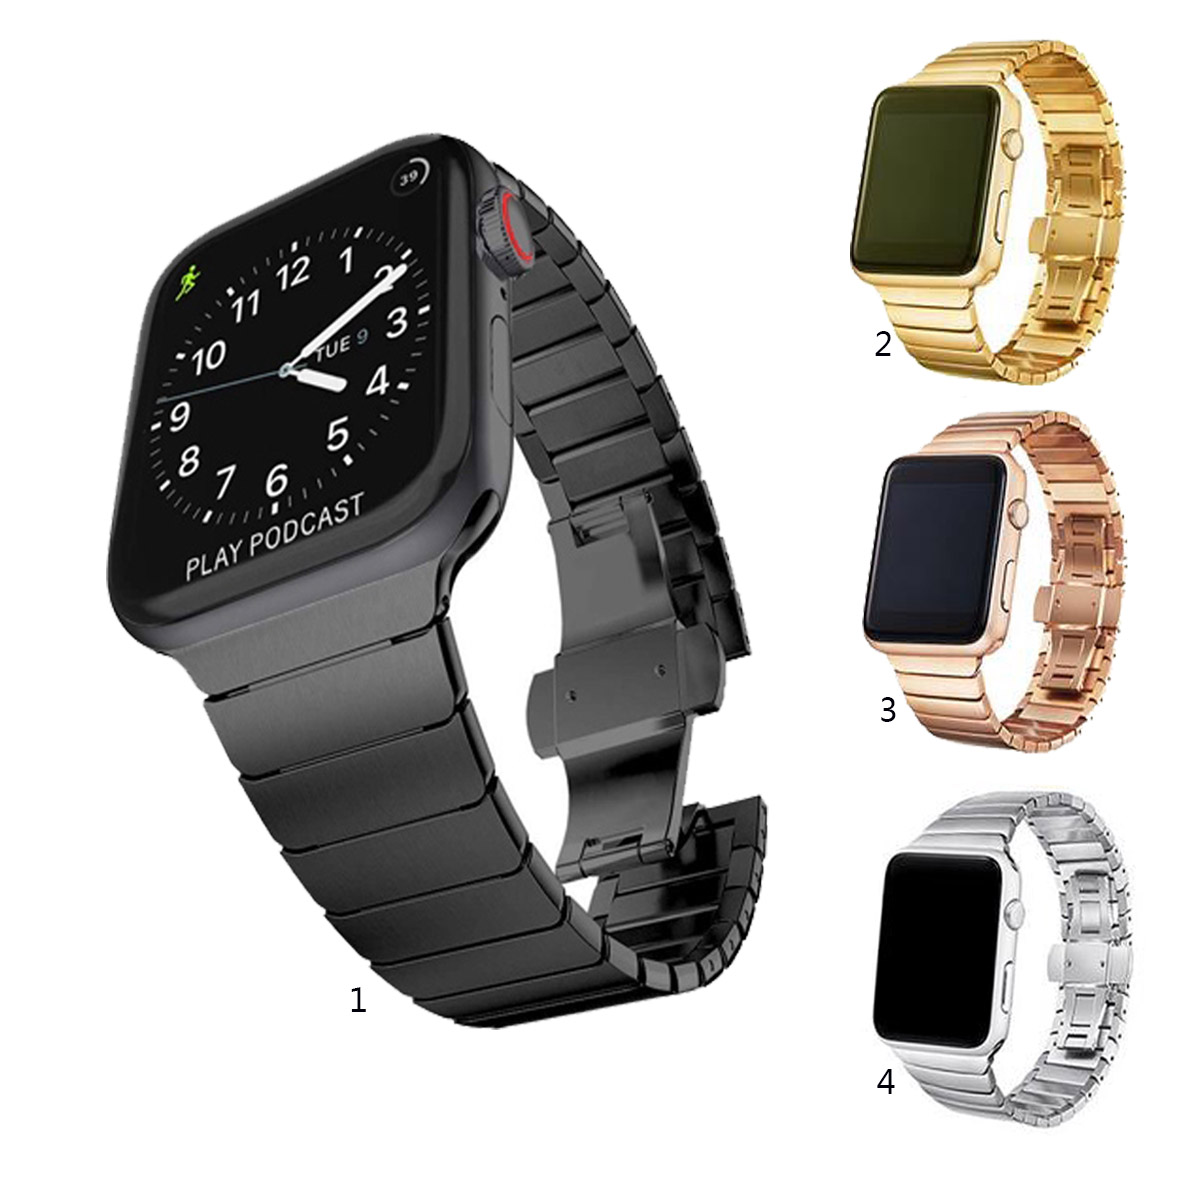 Apple Watch Series 1 2 3 4 5 38mm 40mm 42mm 44mm 不銹鋼 Iwatch